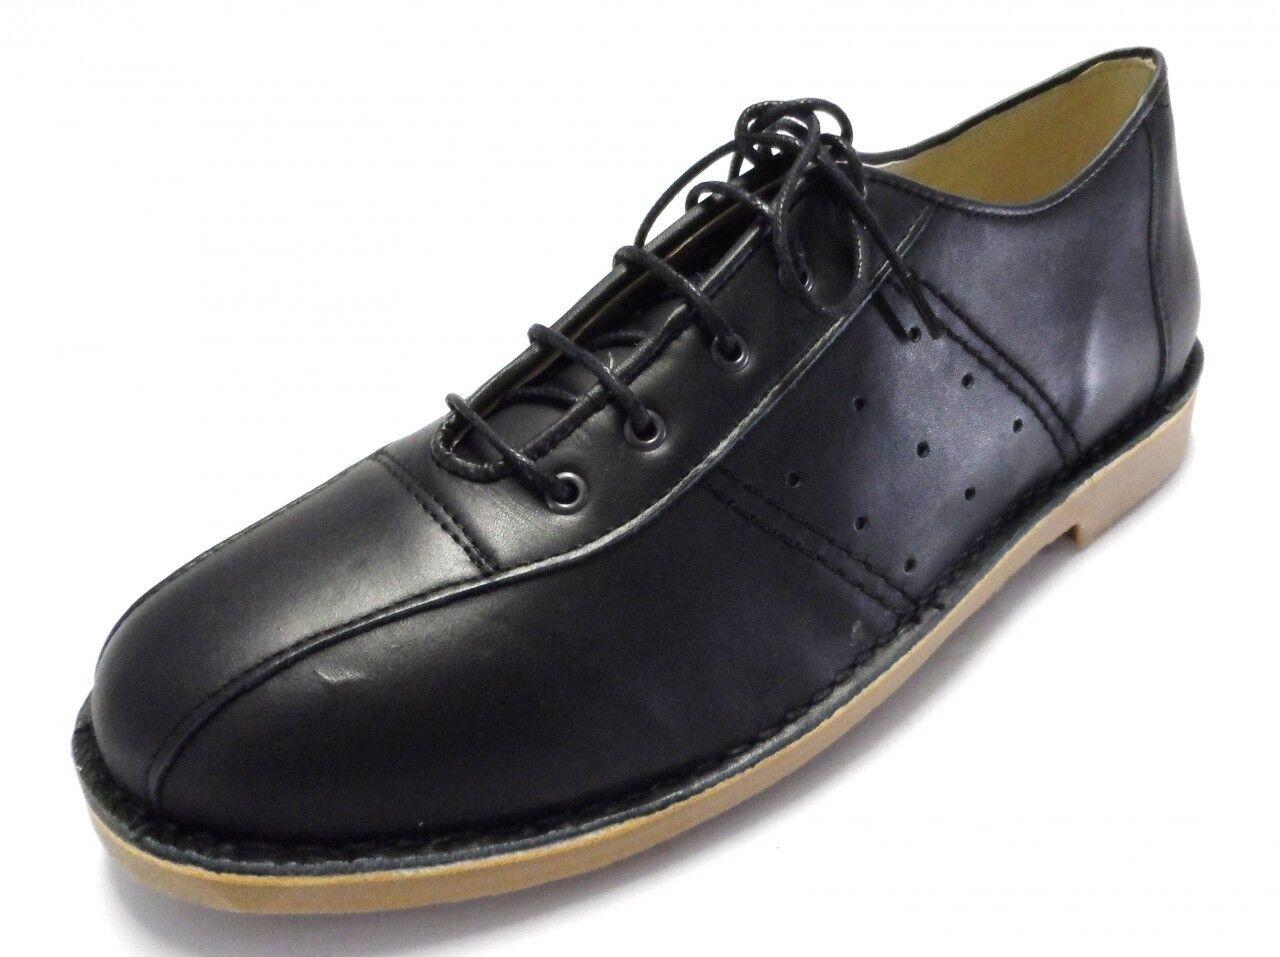 Ikon Marriott Ik20498  Mens  Bowling Shoes Black Leather Mods Rocked 60S